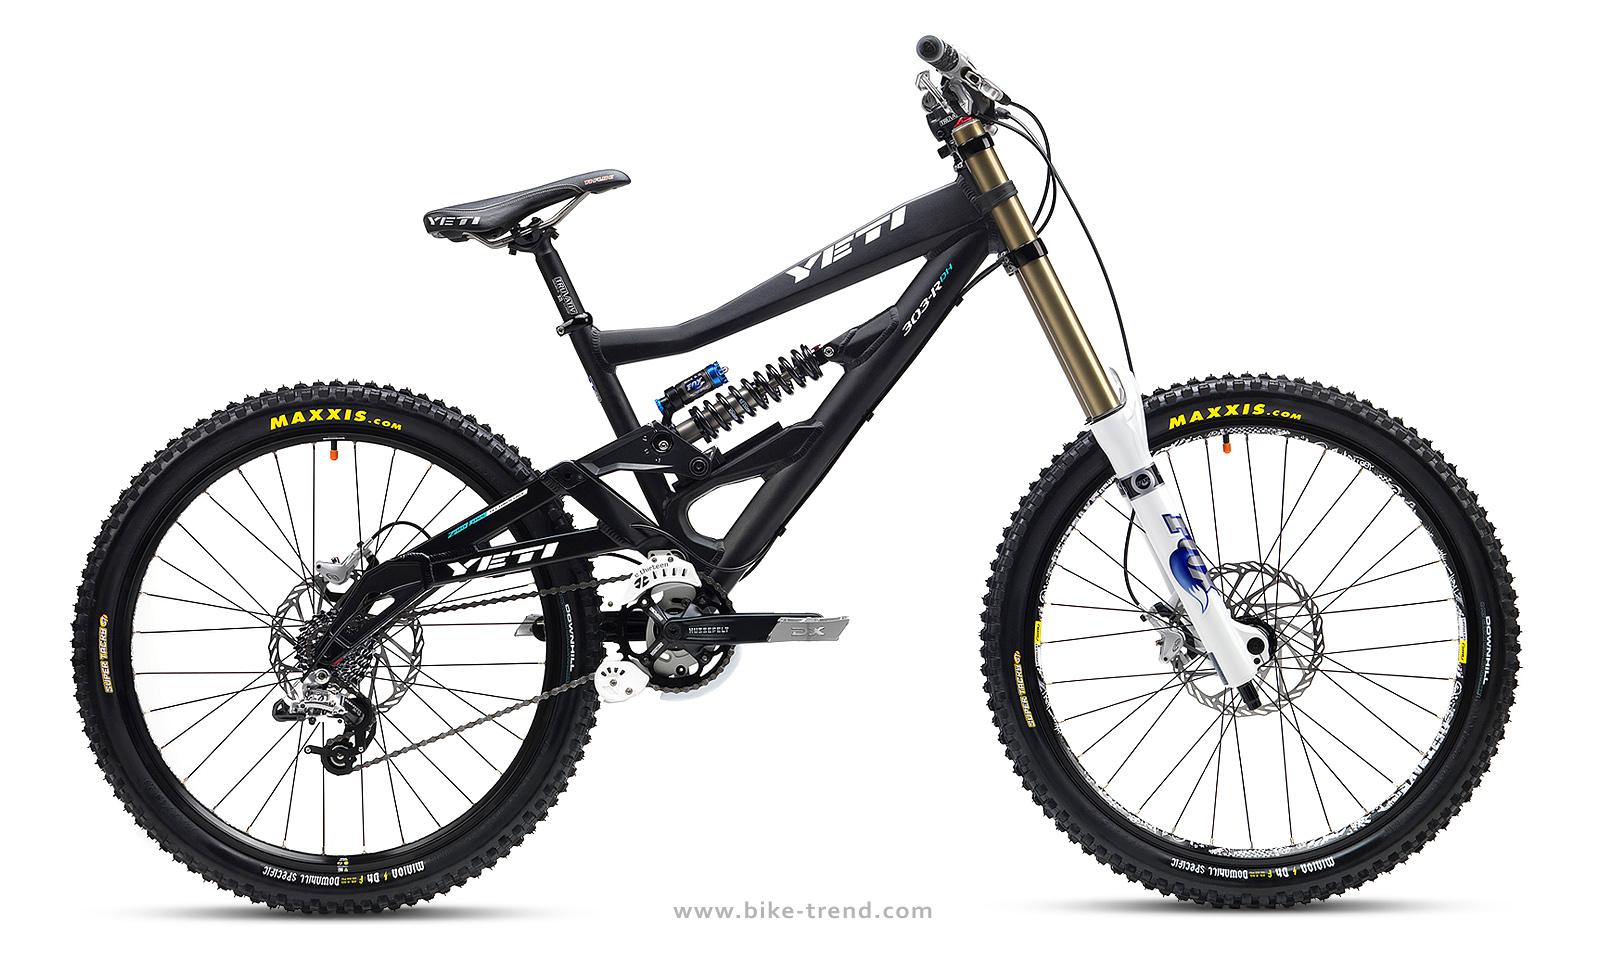 Yeti 303 Rdh 2009 Professional Bike Bike Trend